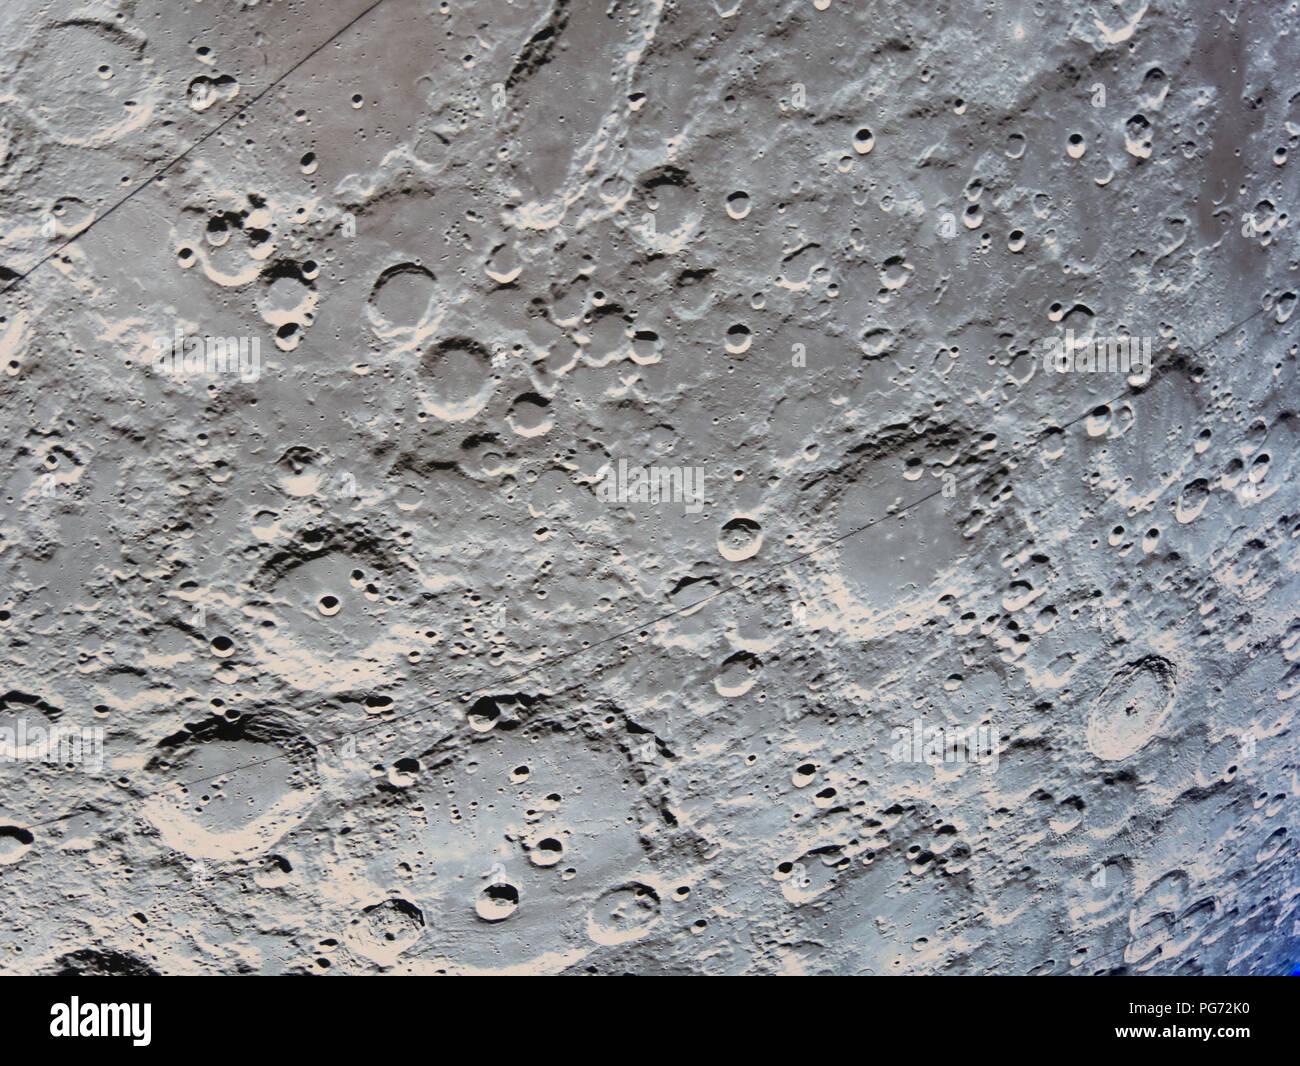 Museum of the Moon, artwork by Luke Jerram - Stock Image